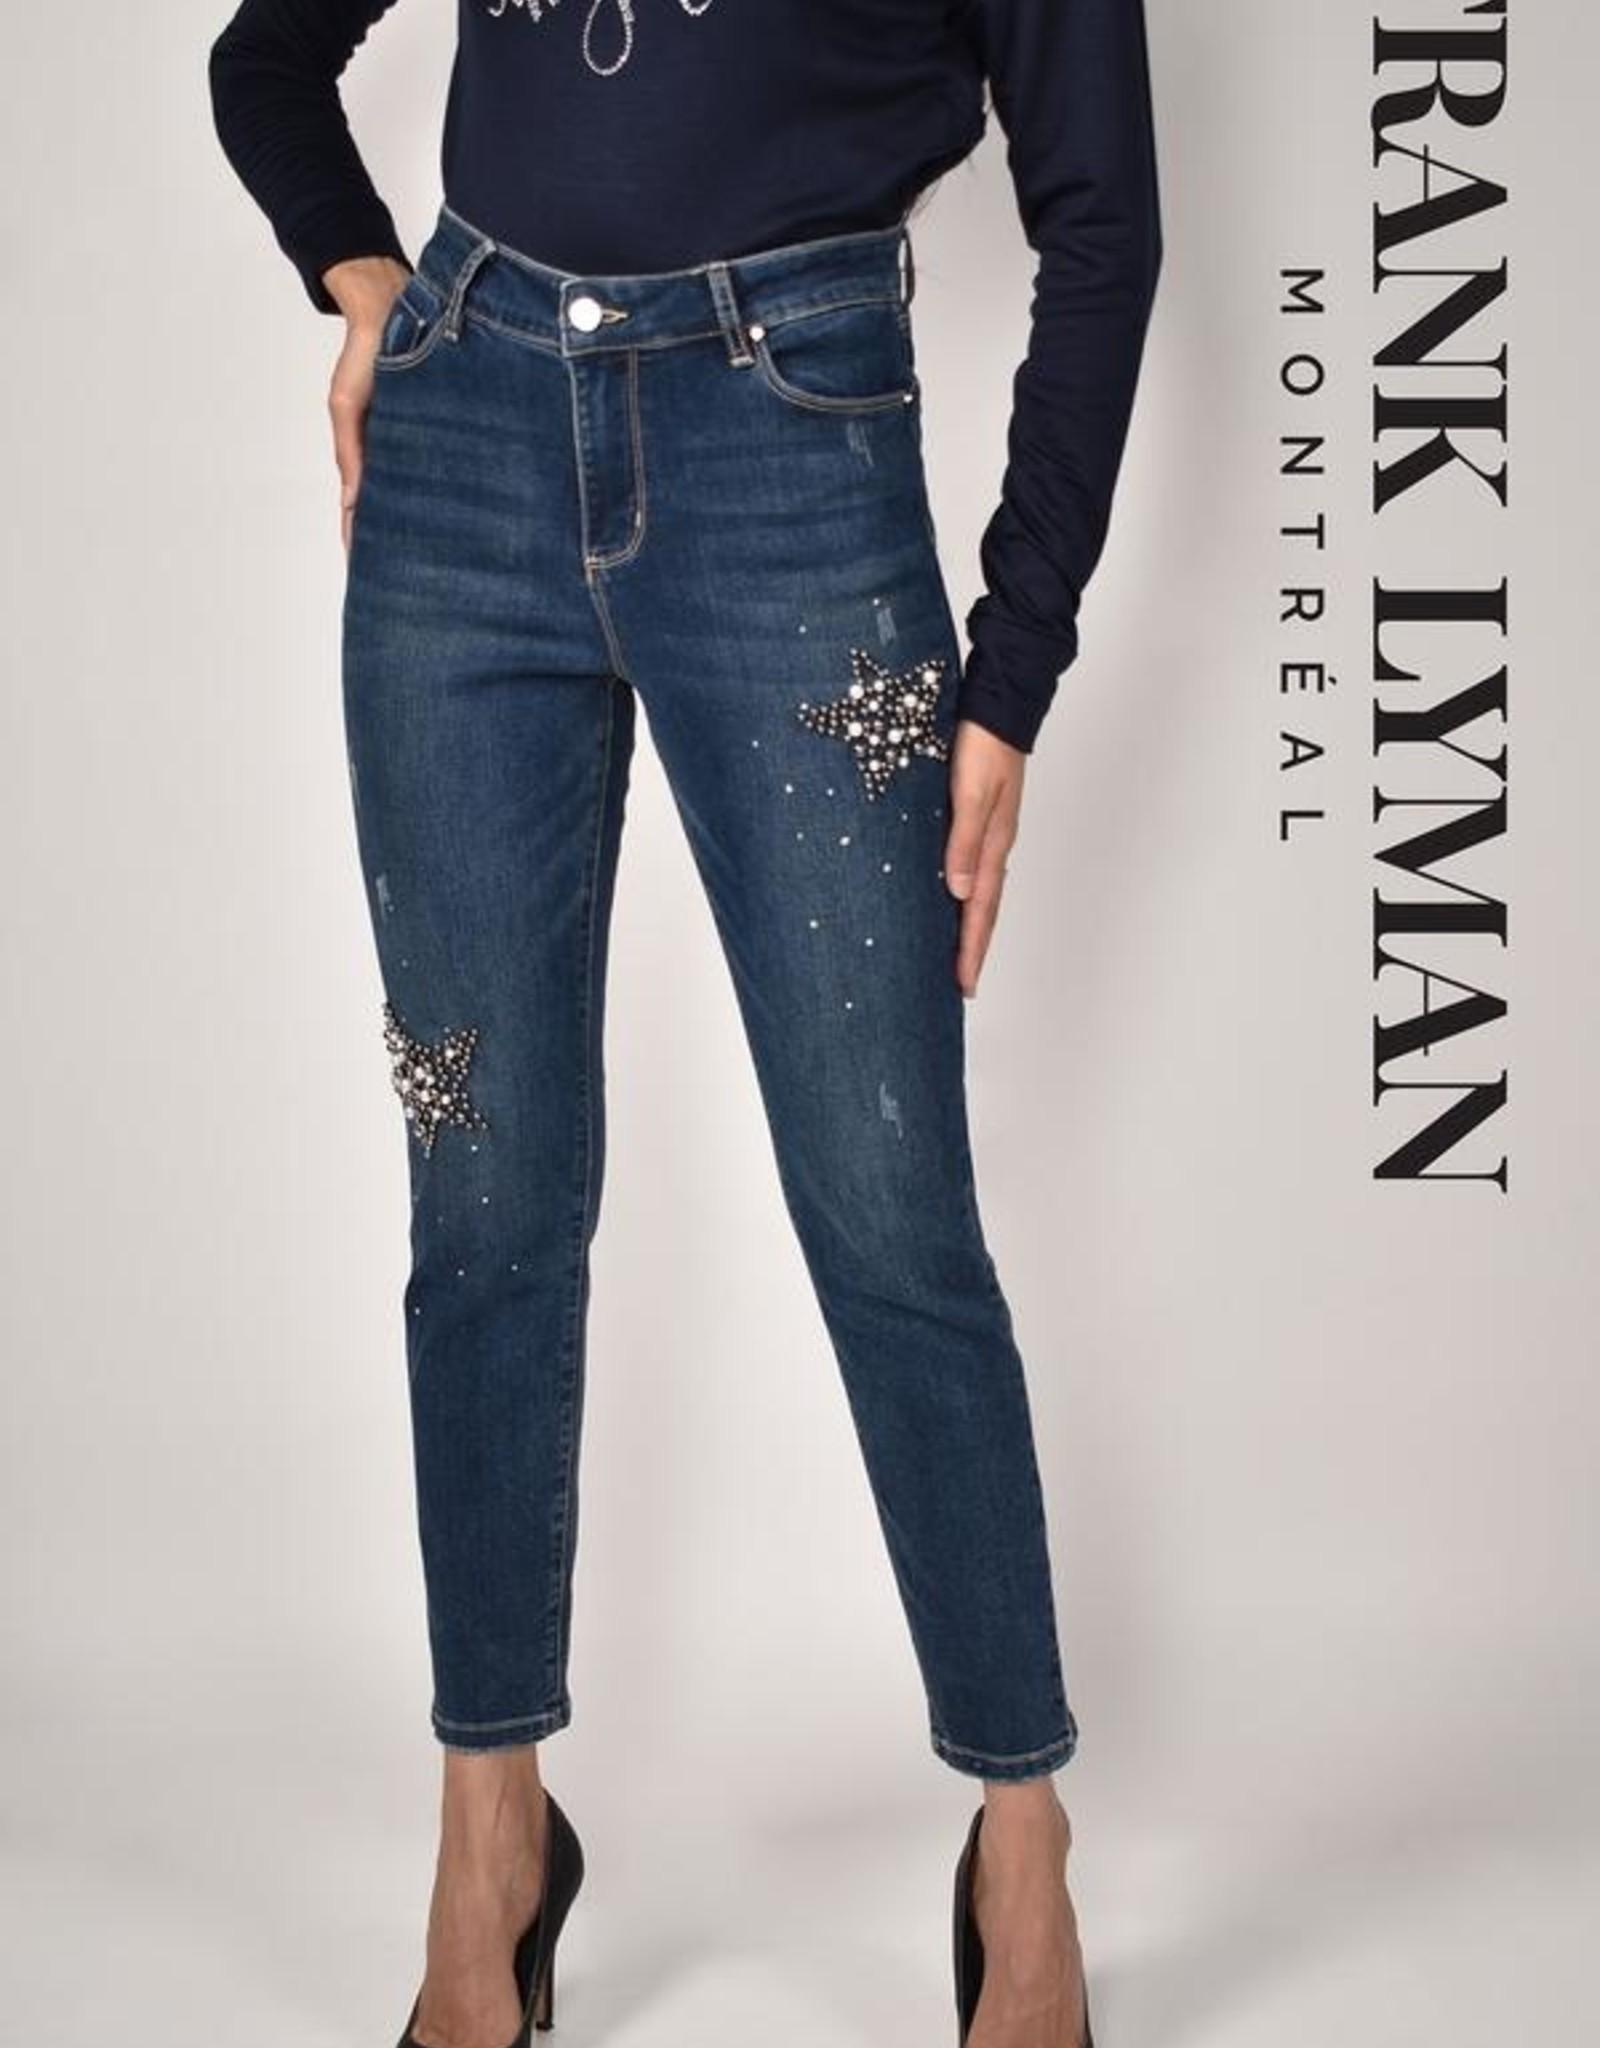 Frank Lyman Frank Lyman 214154U Dark Denim Pant with some Distressing and Pearl Star Embellishments